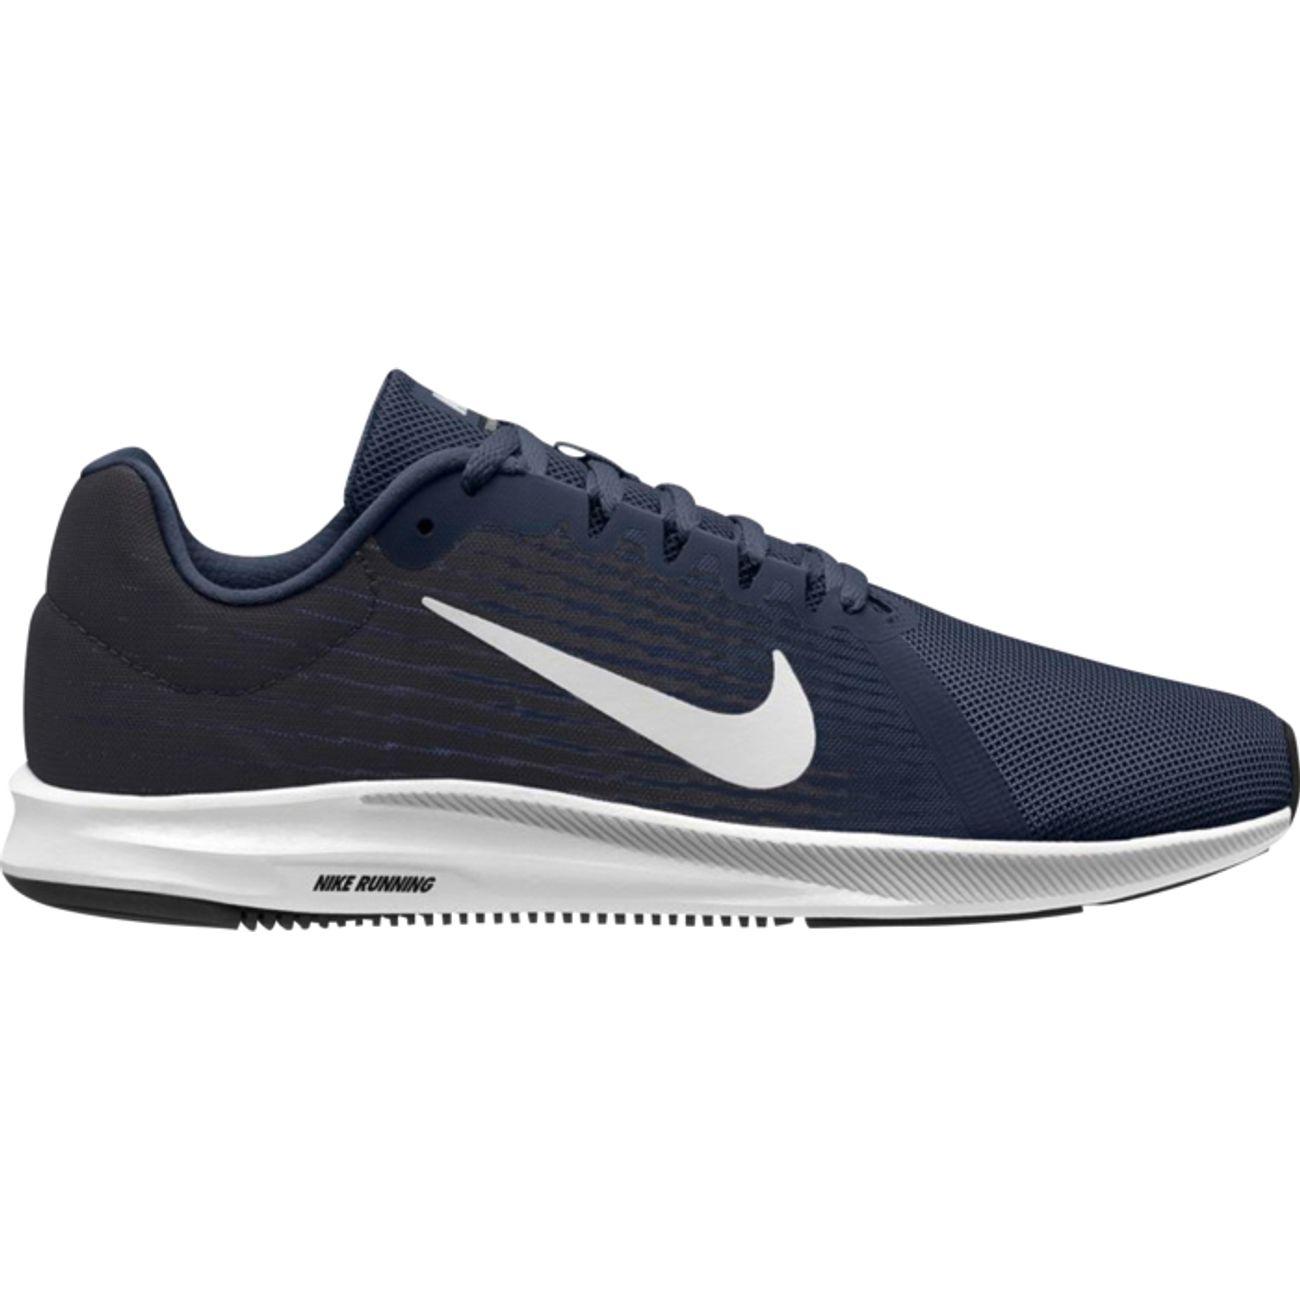 Nike Bte Basses DownshifterMarine Homme Chaussures Running 80OnPkXw